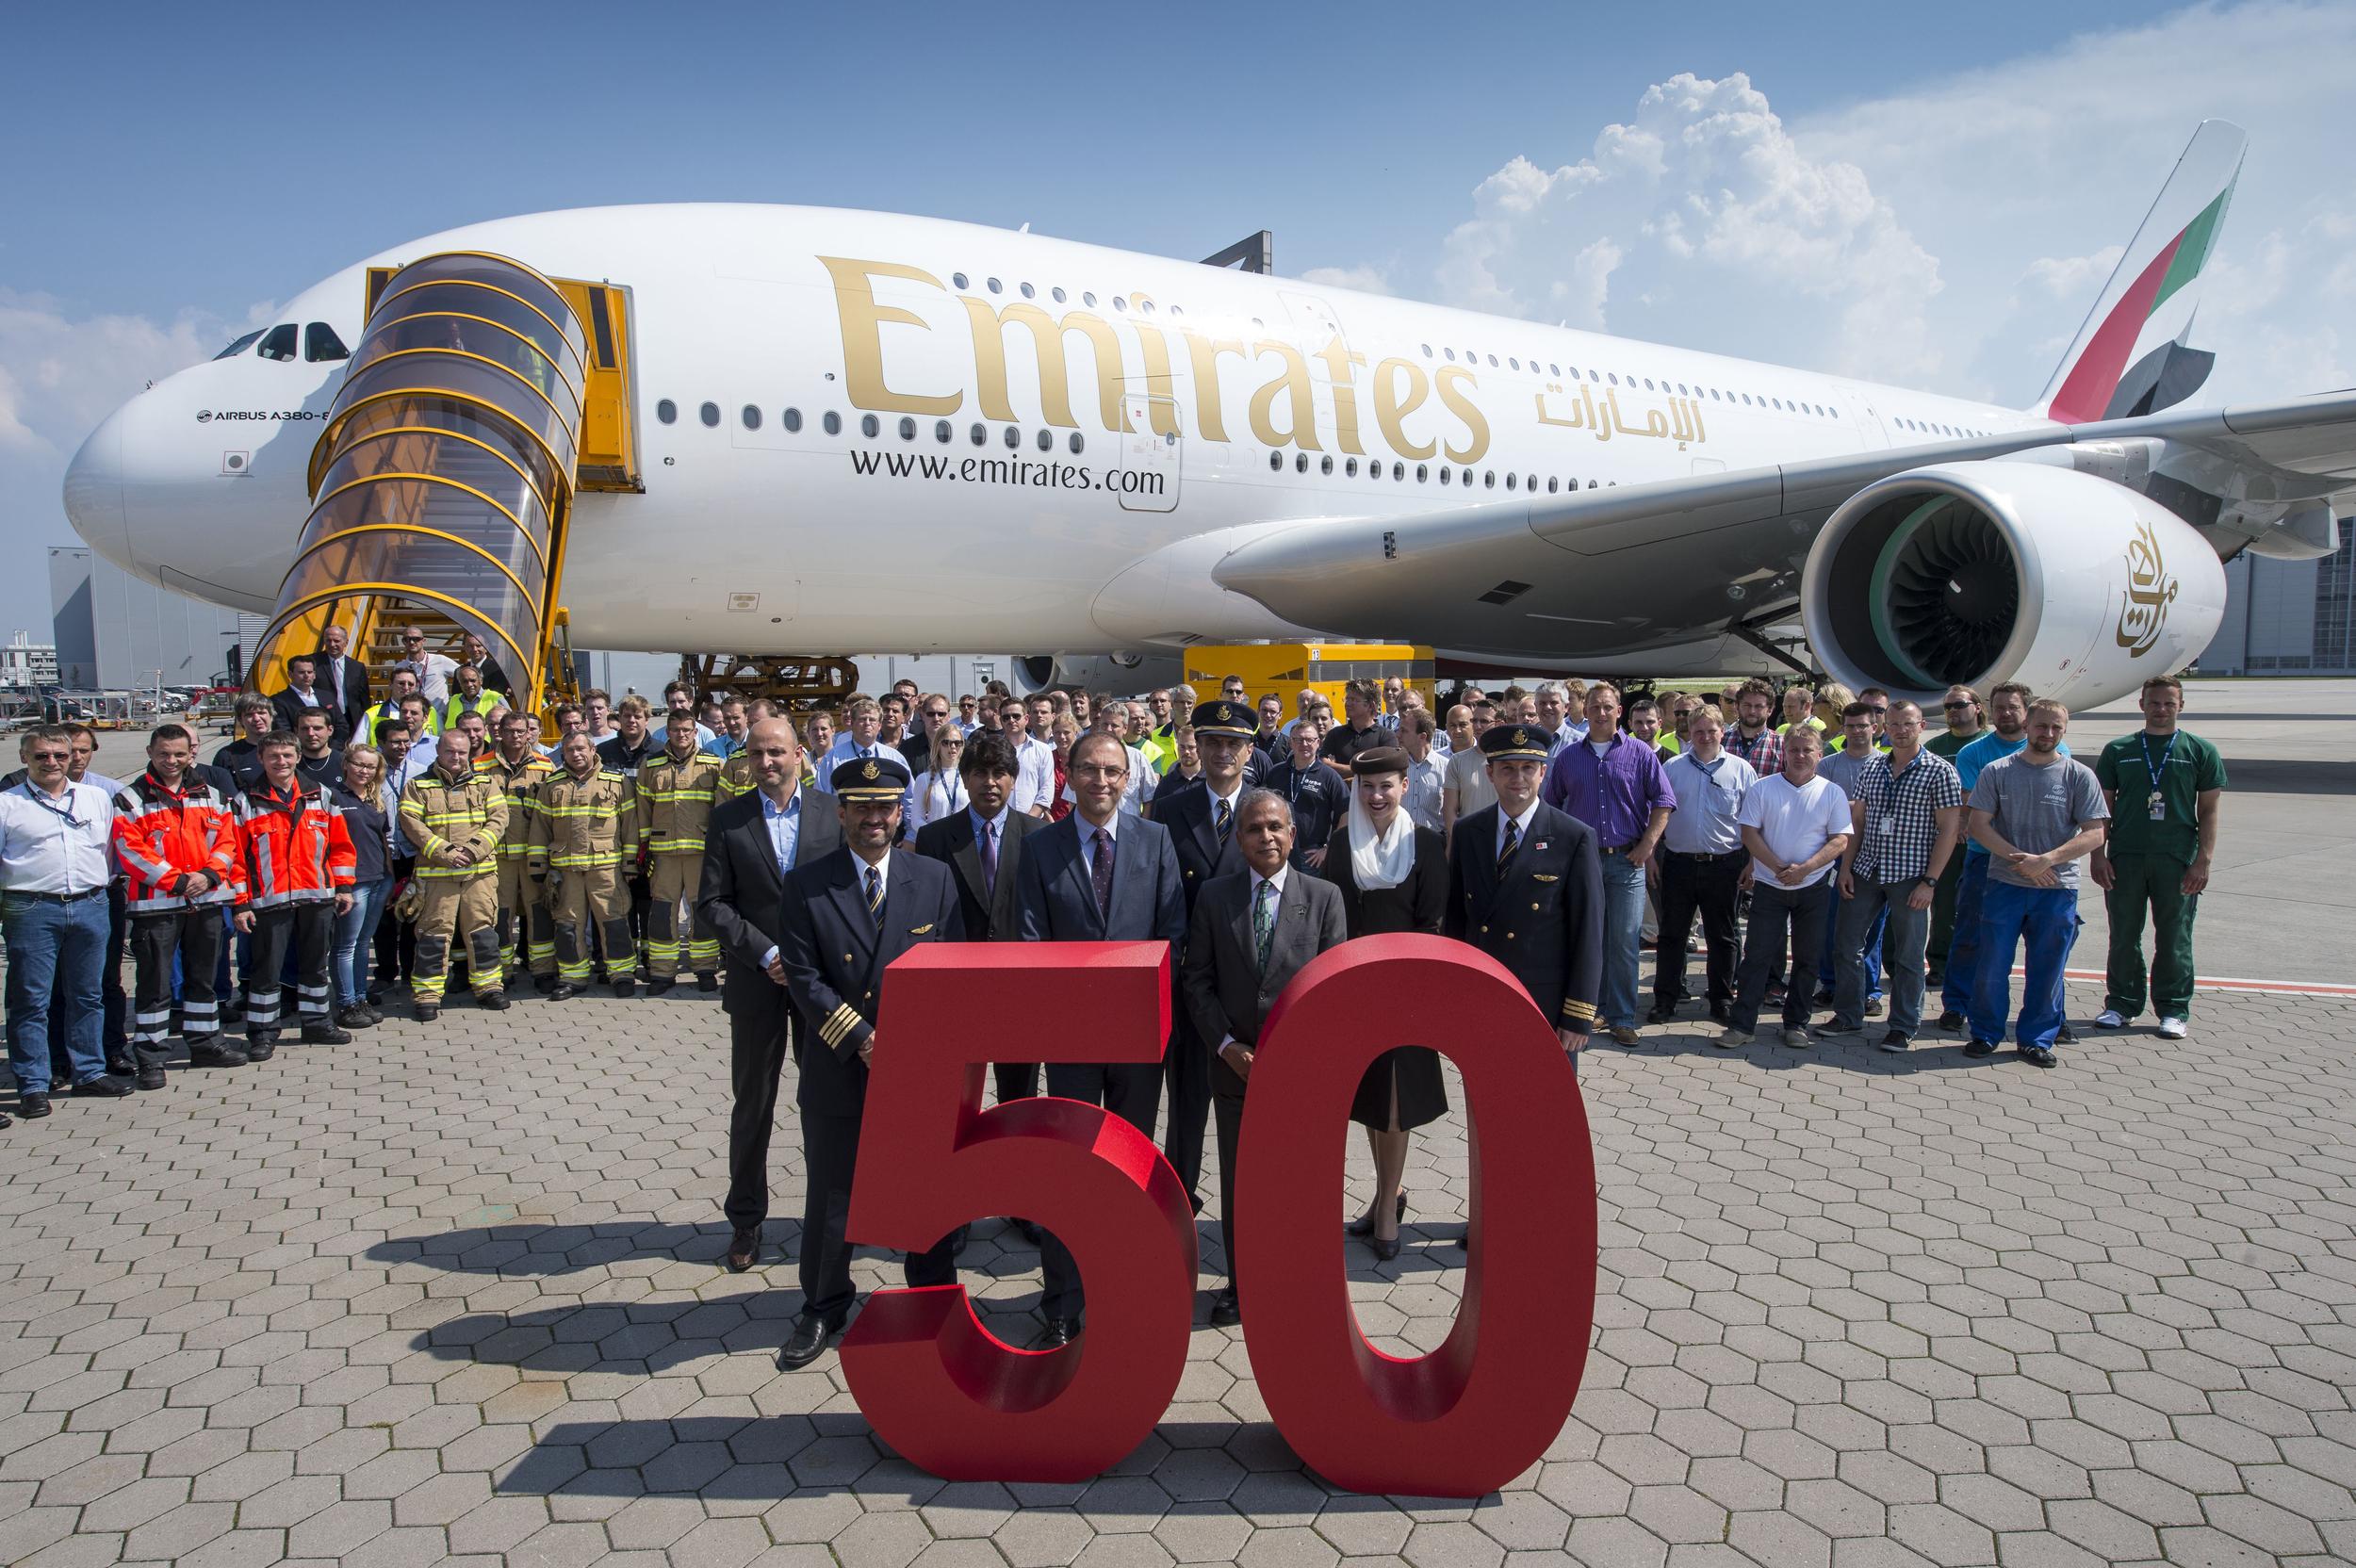 50+ smiles. (image credit: Emirates Group)